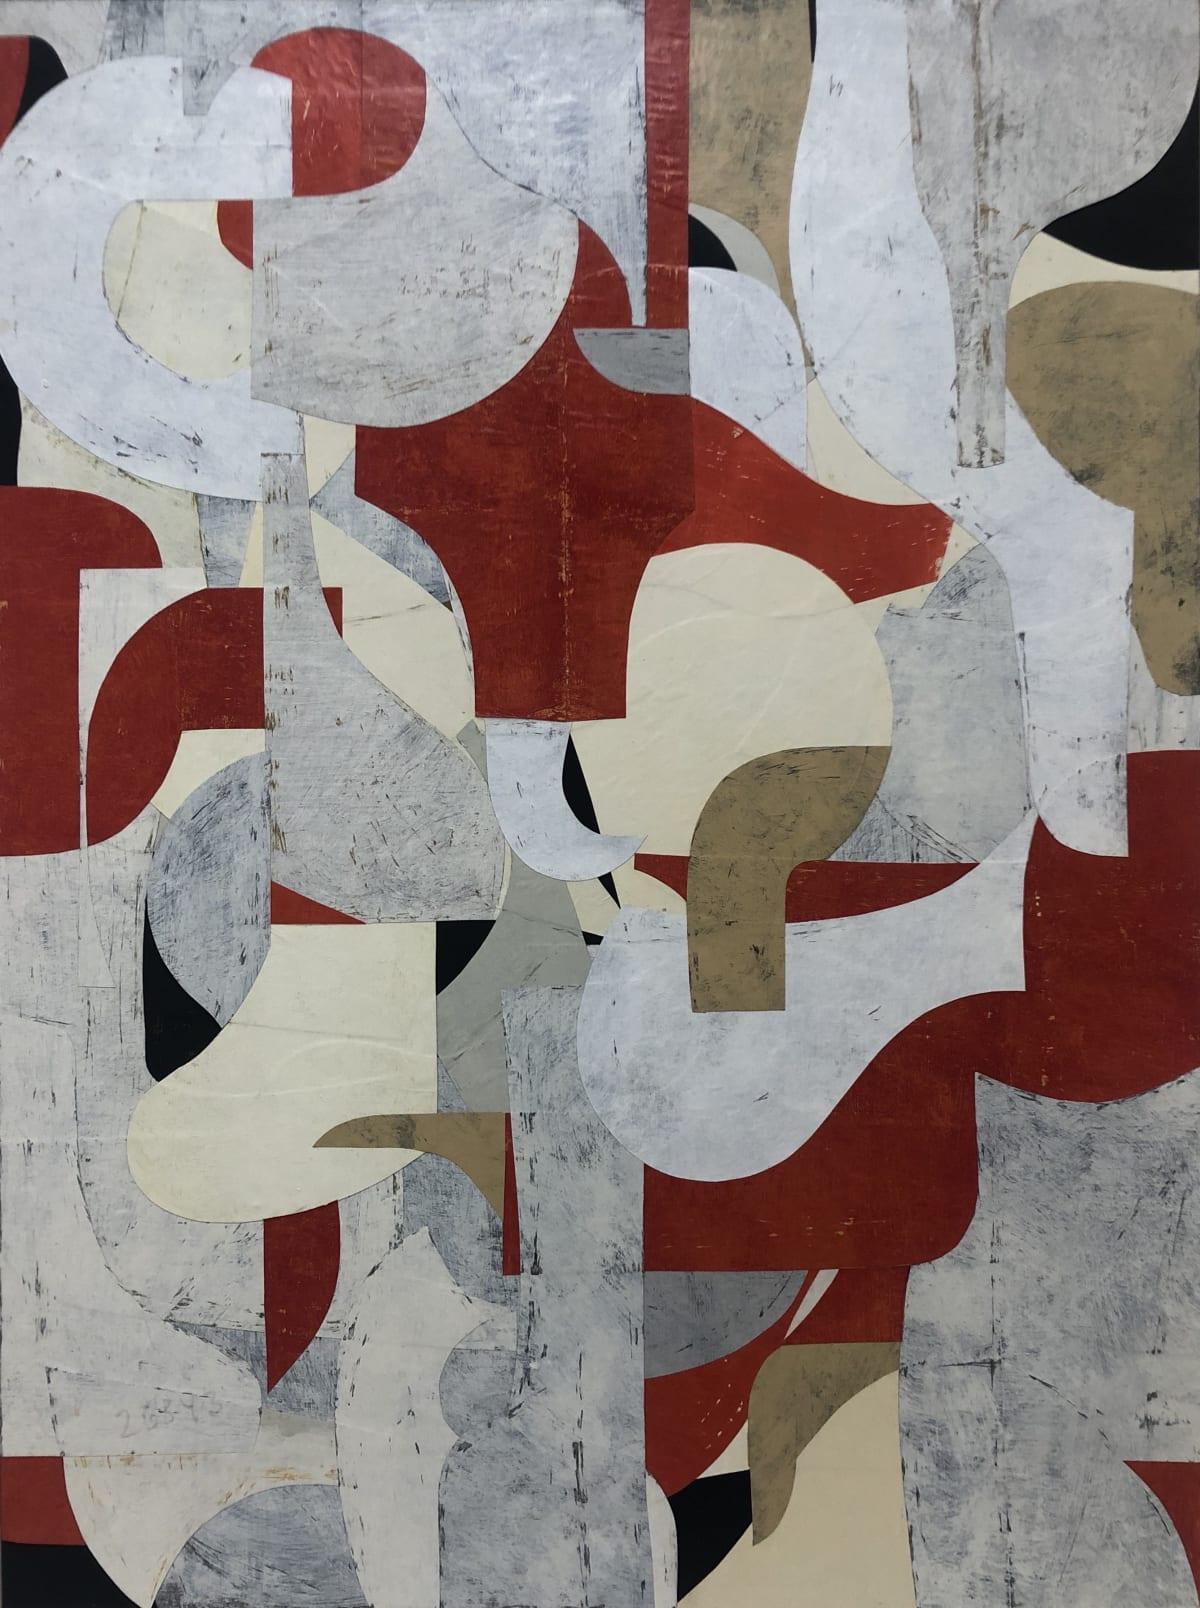 Daniel Anselmi, Untitled (2-15), 2018